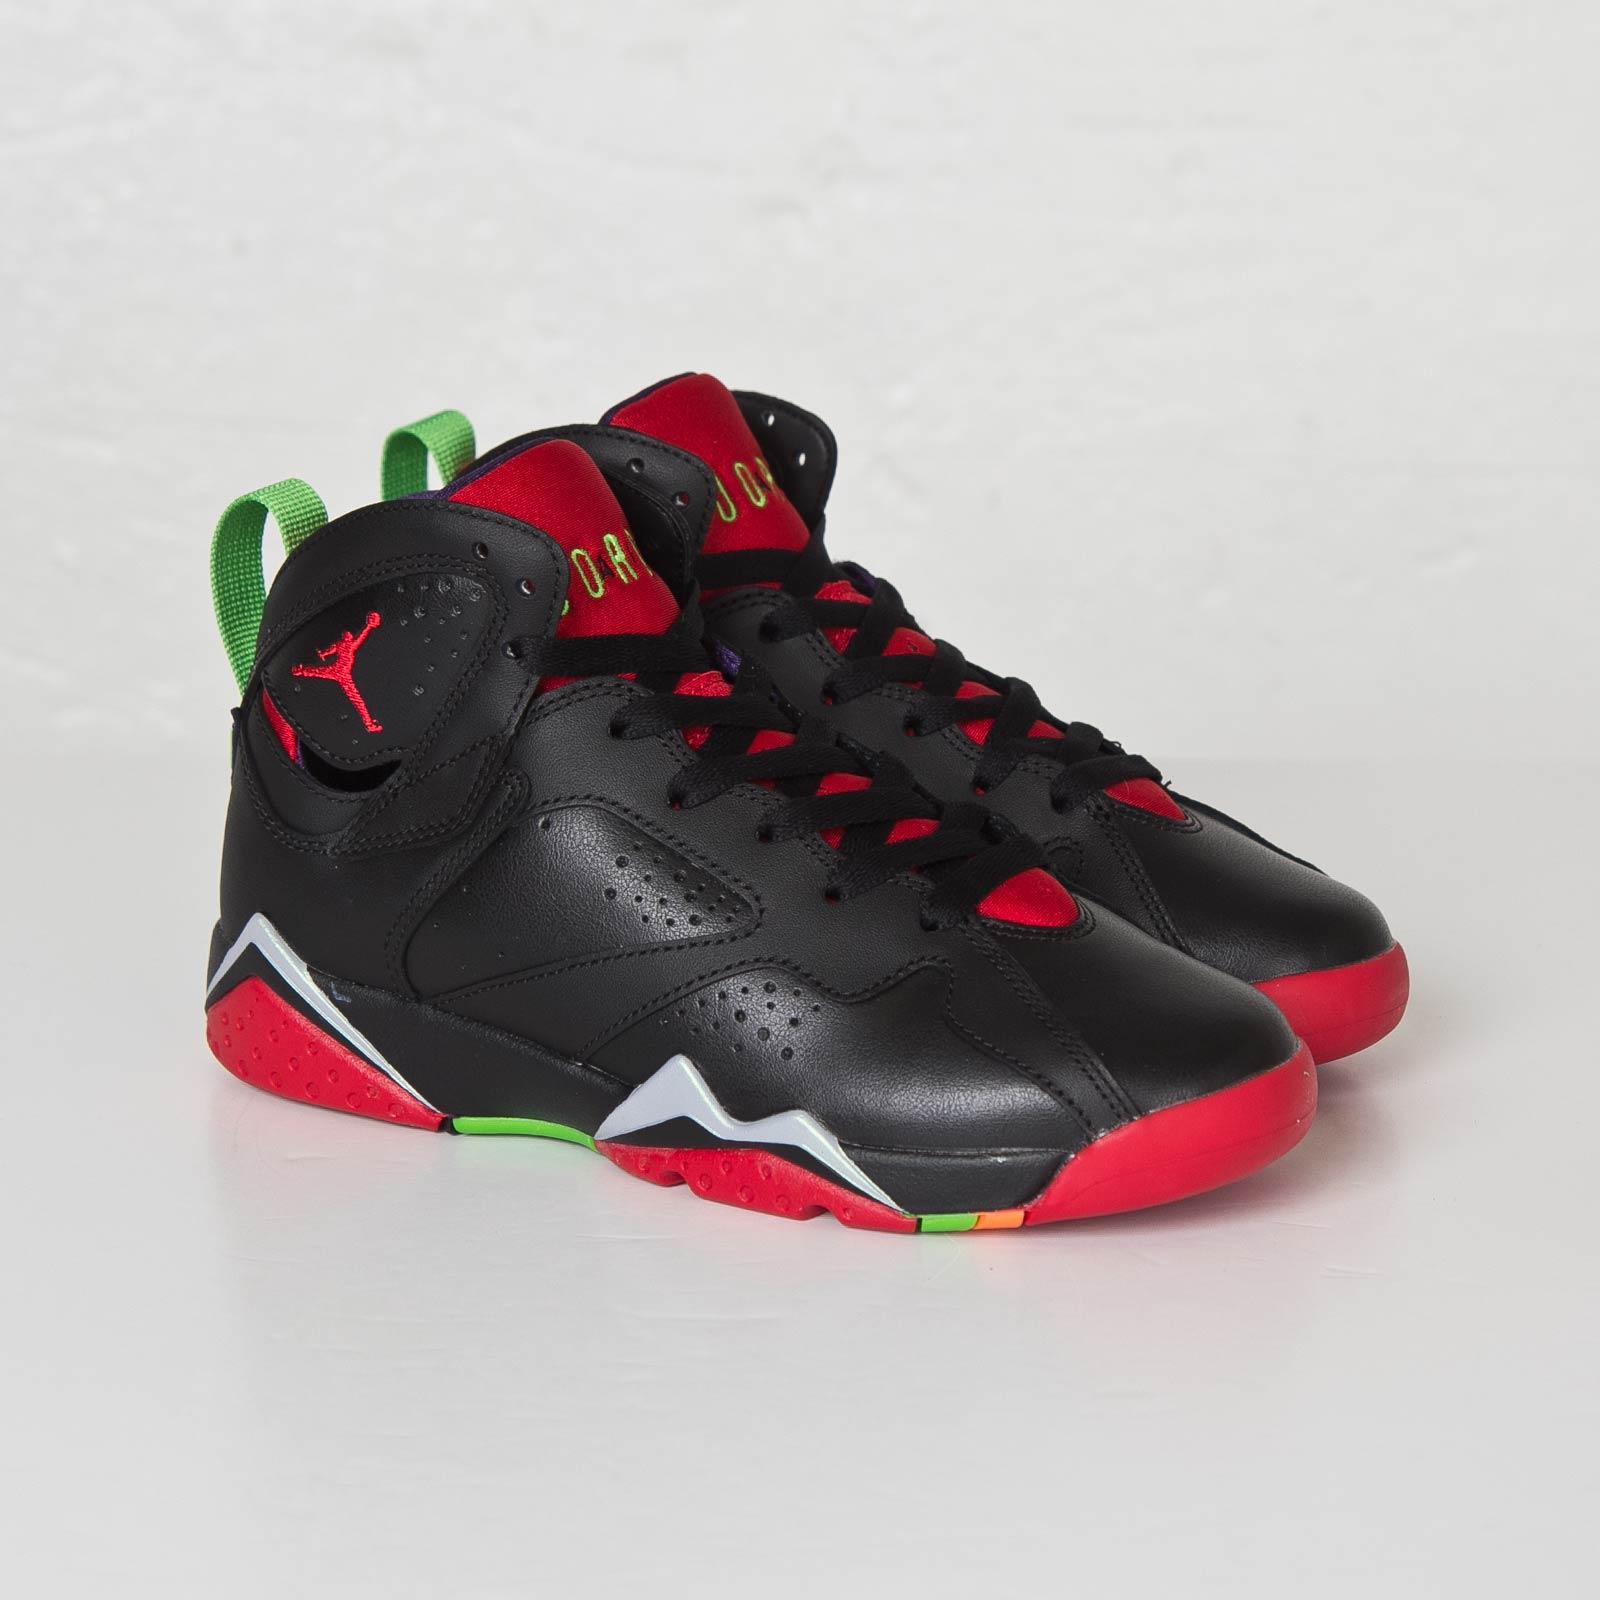 46fe5ae4daa398 Jordan Brand Air Jordan 7 Retro (GS) - 304774-029 - Sneakersnstuff ...